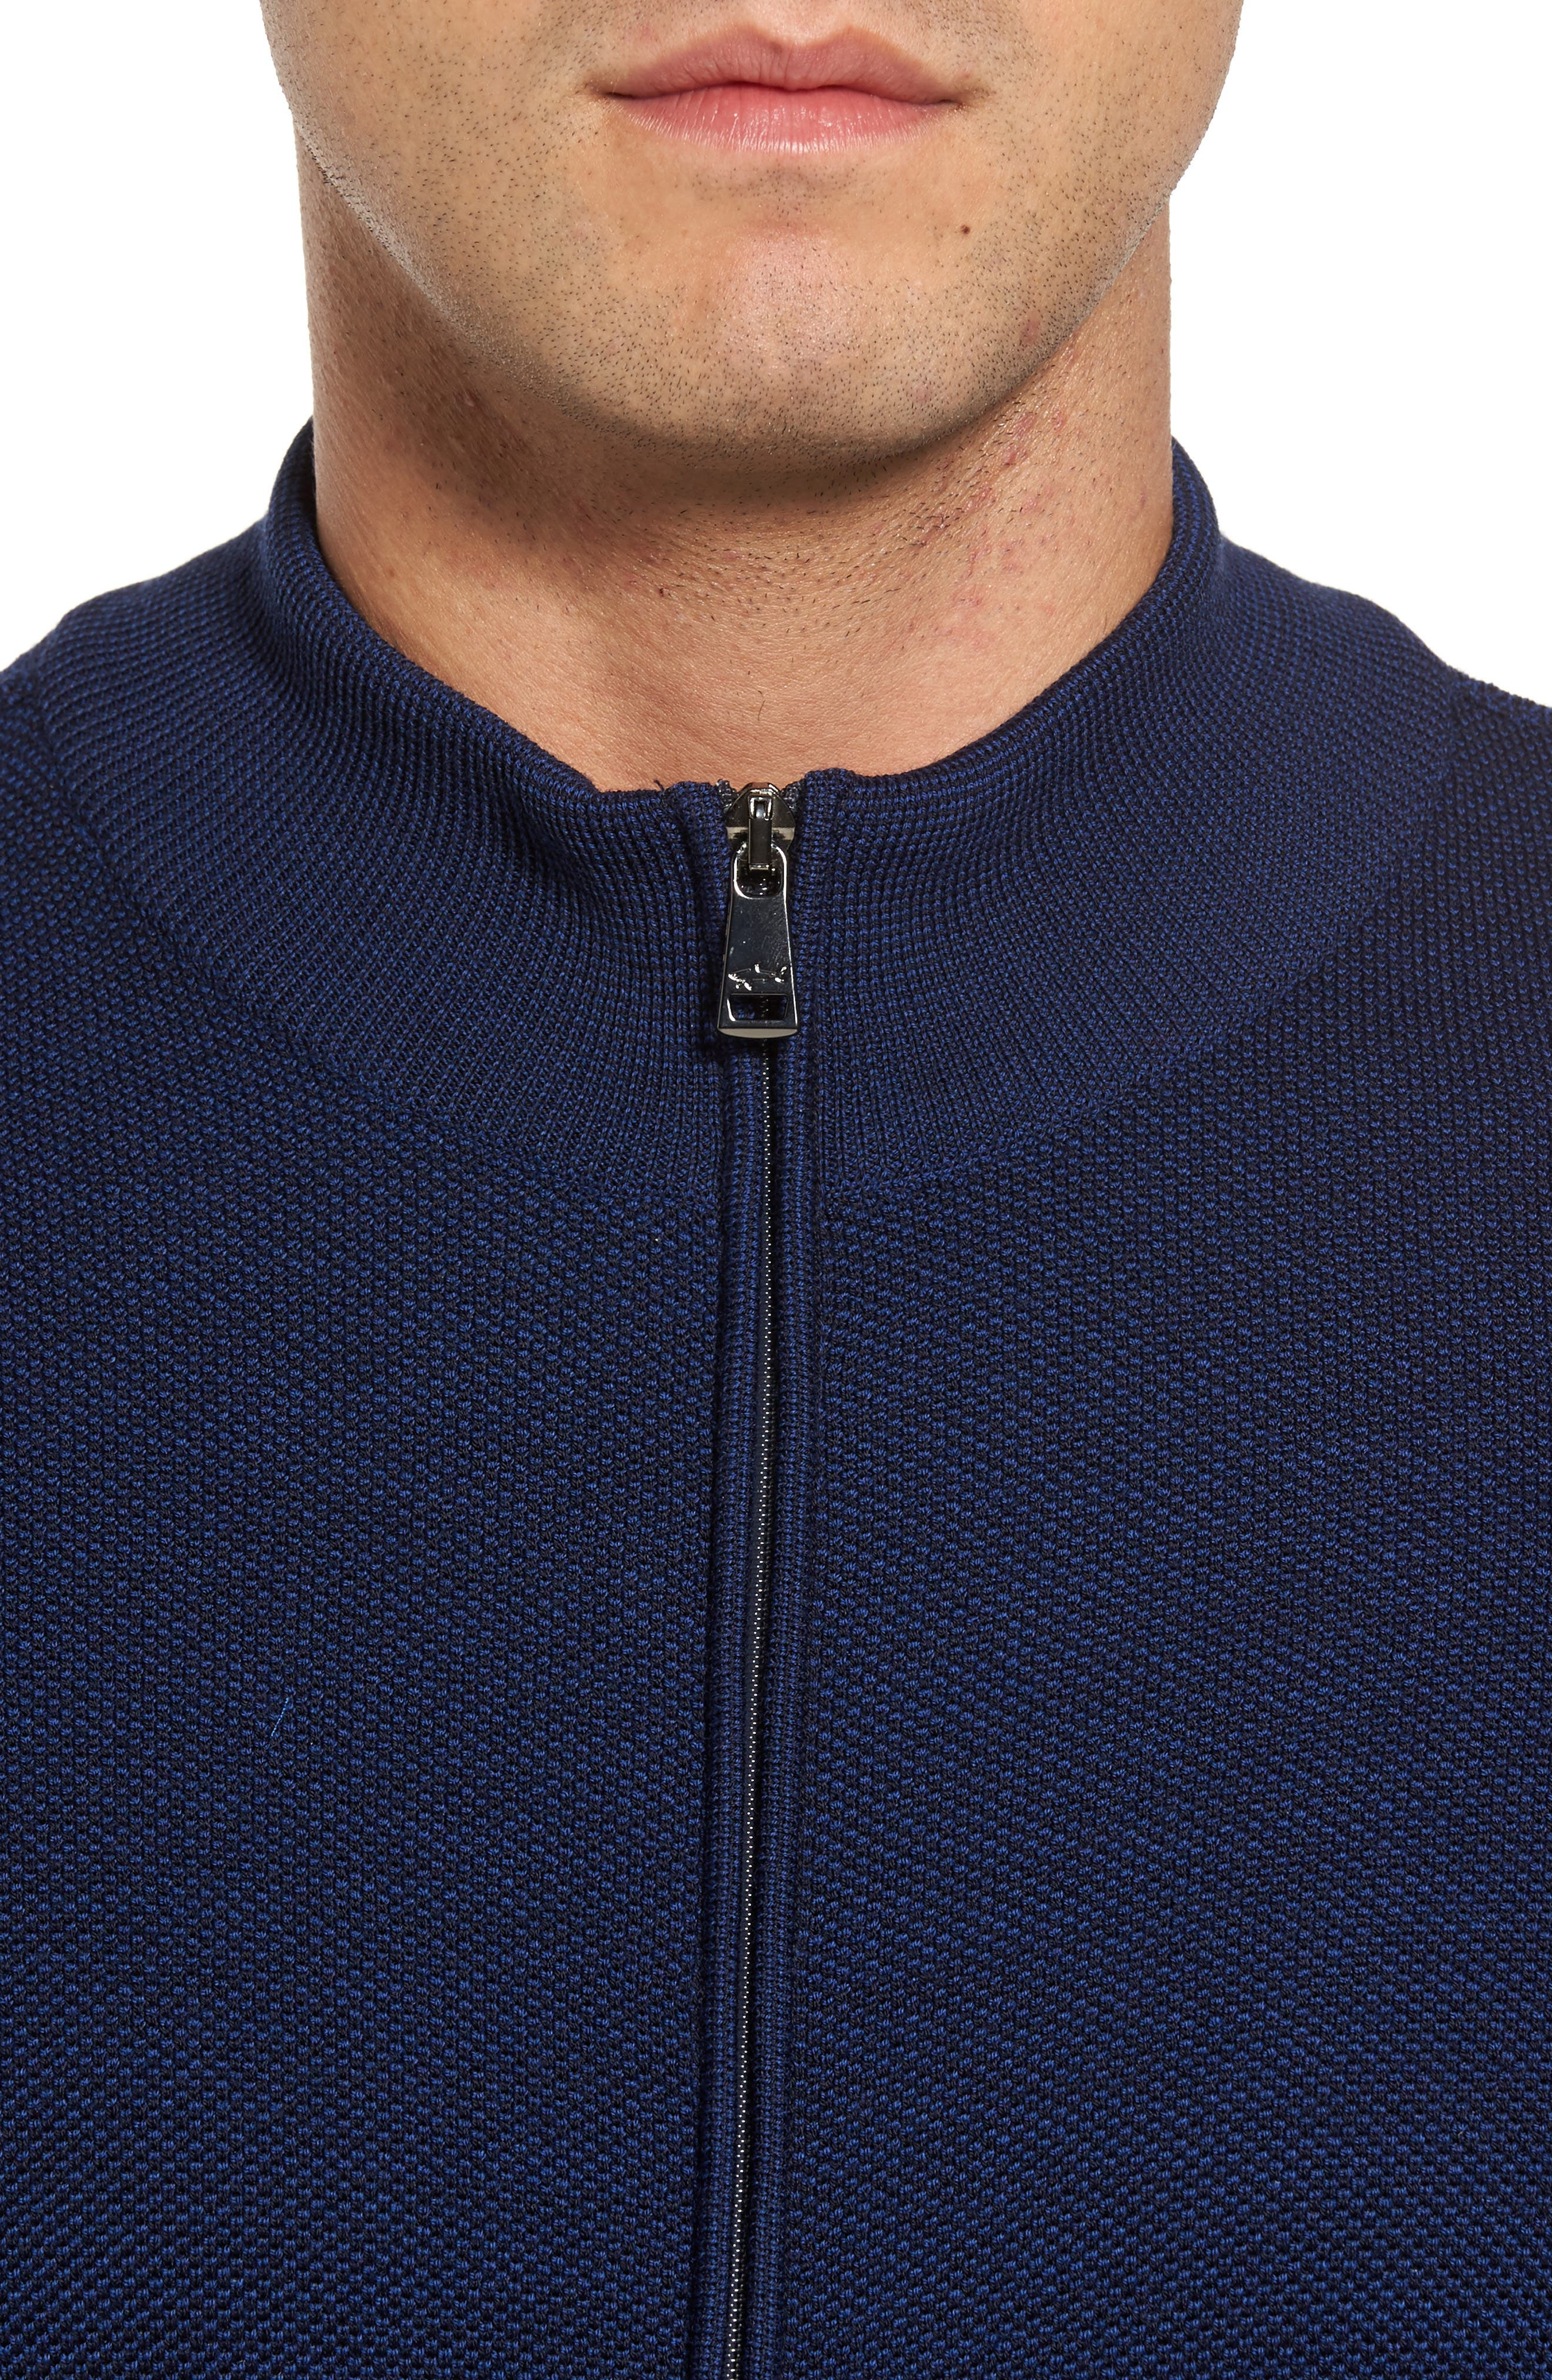 Alternate Image 4  - Paul & Shark Piqué Zip Wool Sweater